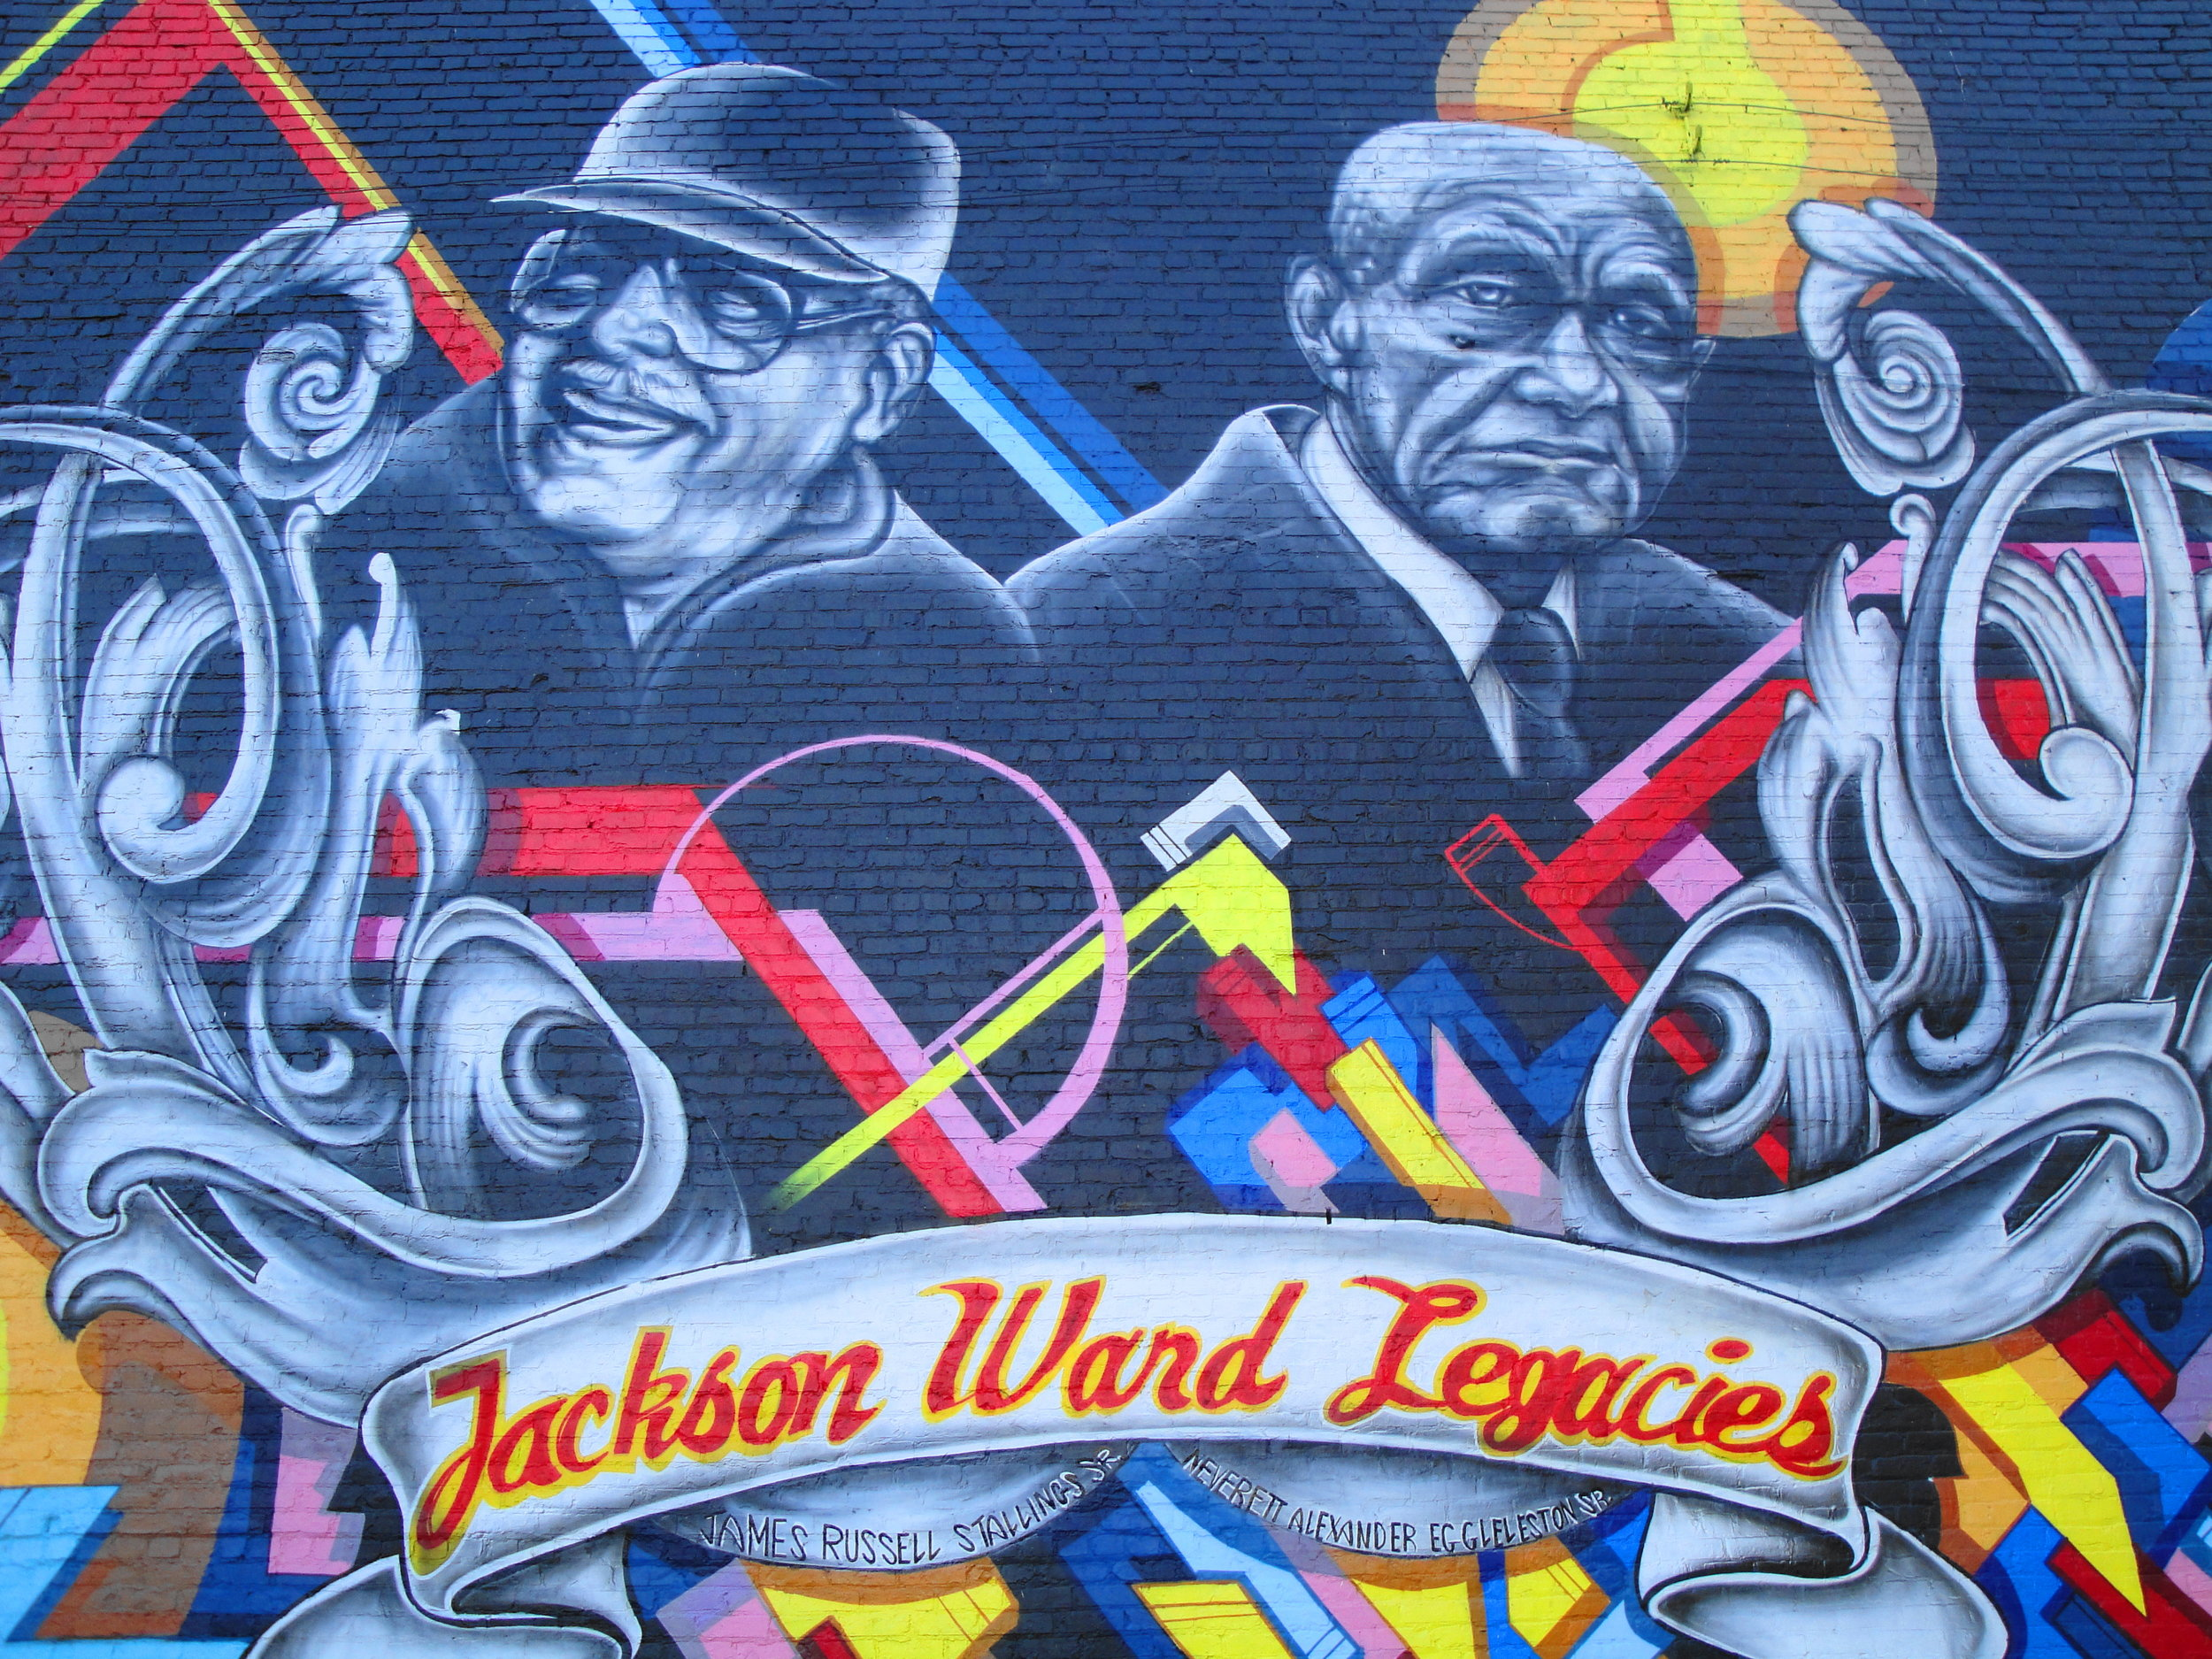 Jackson Ward mural.JPG